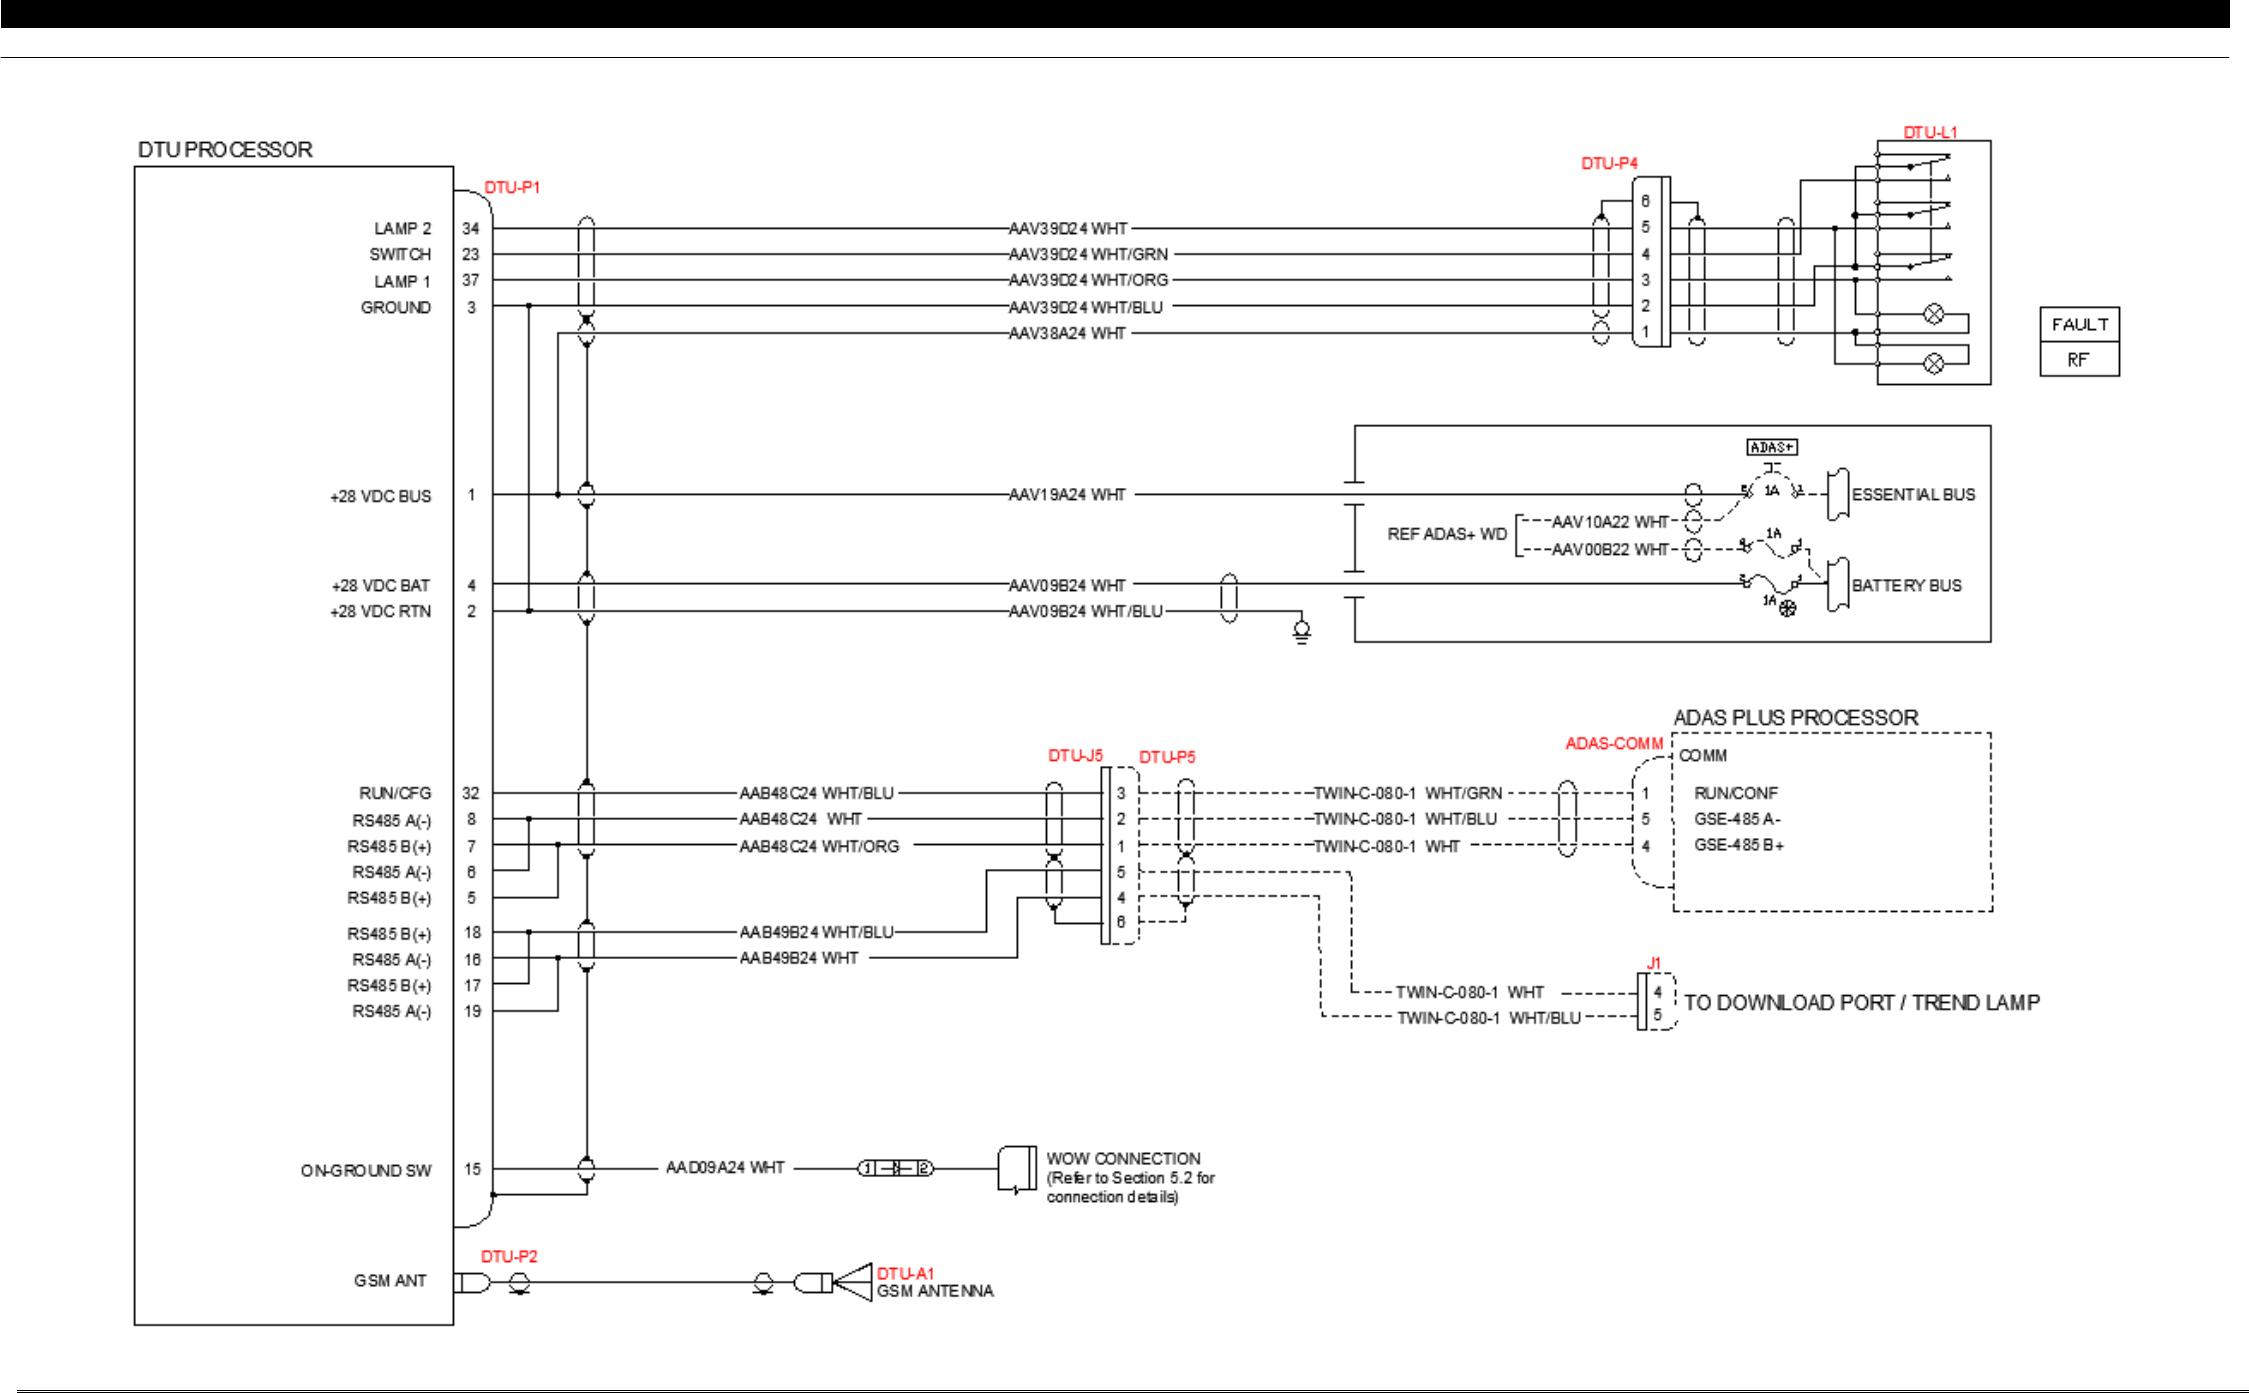 Pratt And Whitney Engine Services Fast34e Flight Data Avan Caravan Wiring Diagram Pw Inc Transmission Unit Dtu G 010 1 B